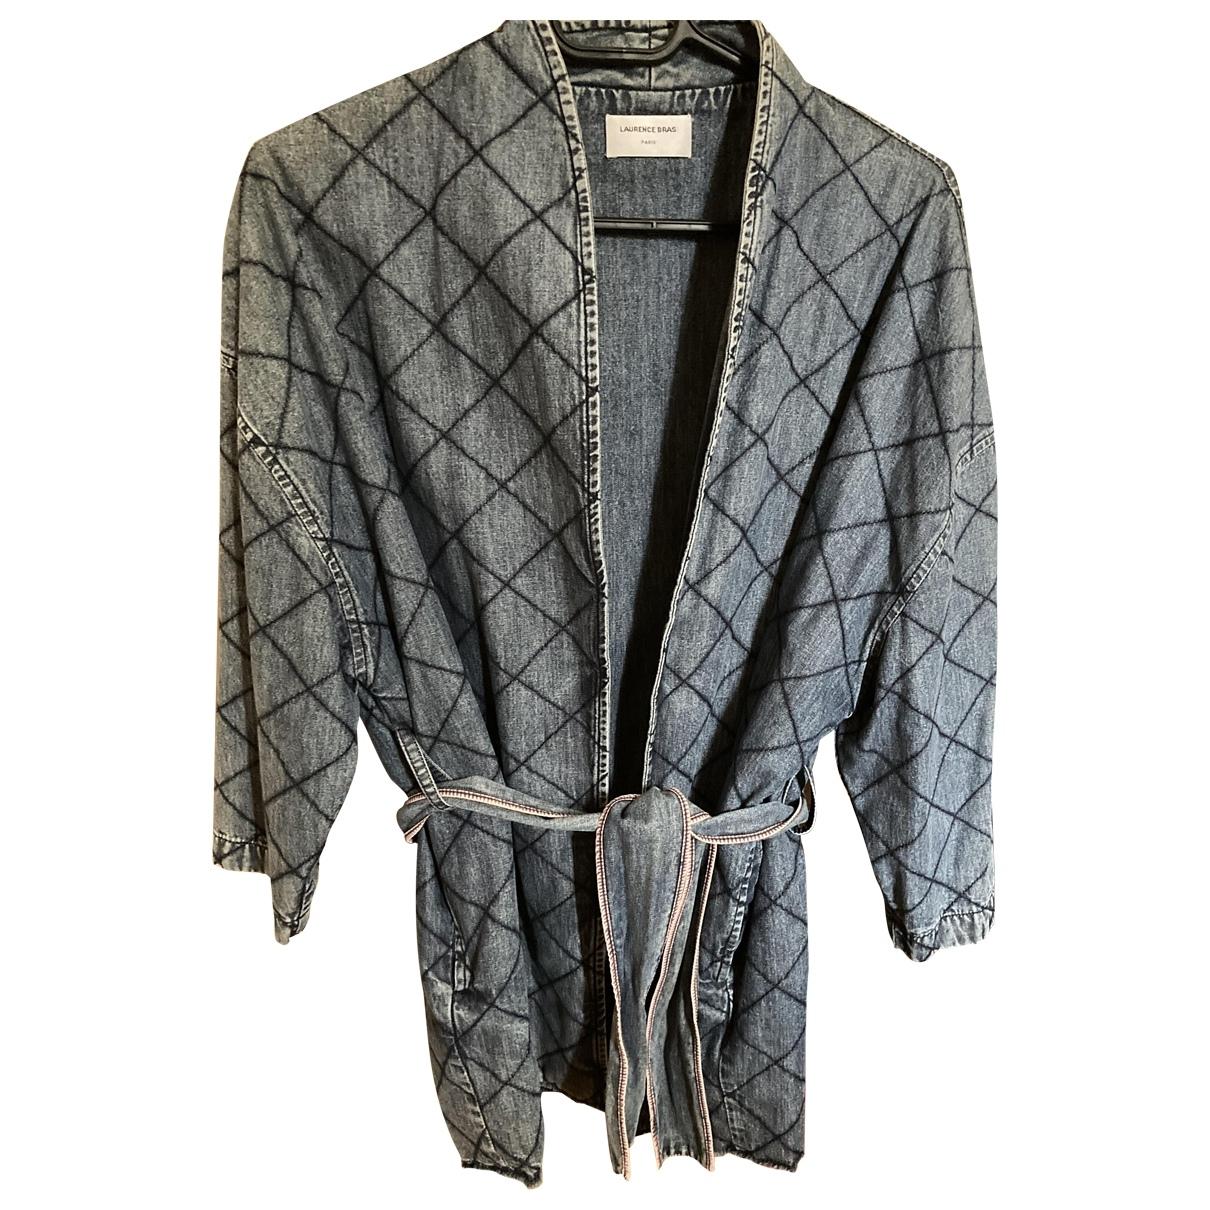 Laurence Bras N Blue Denim - Jeans Jacket for Women